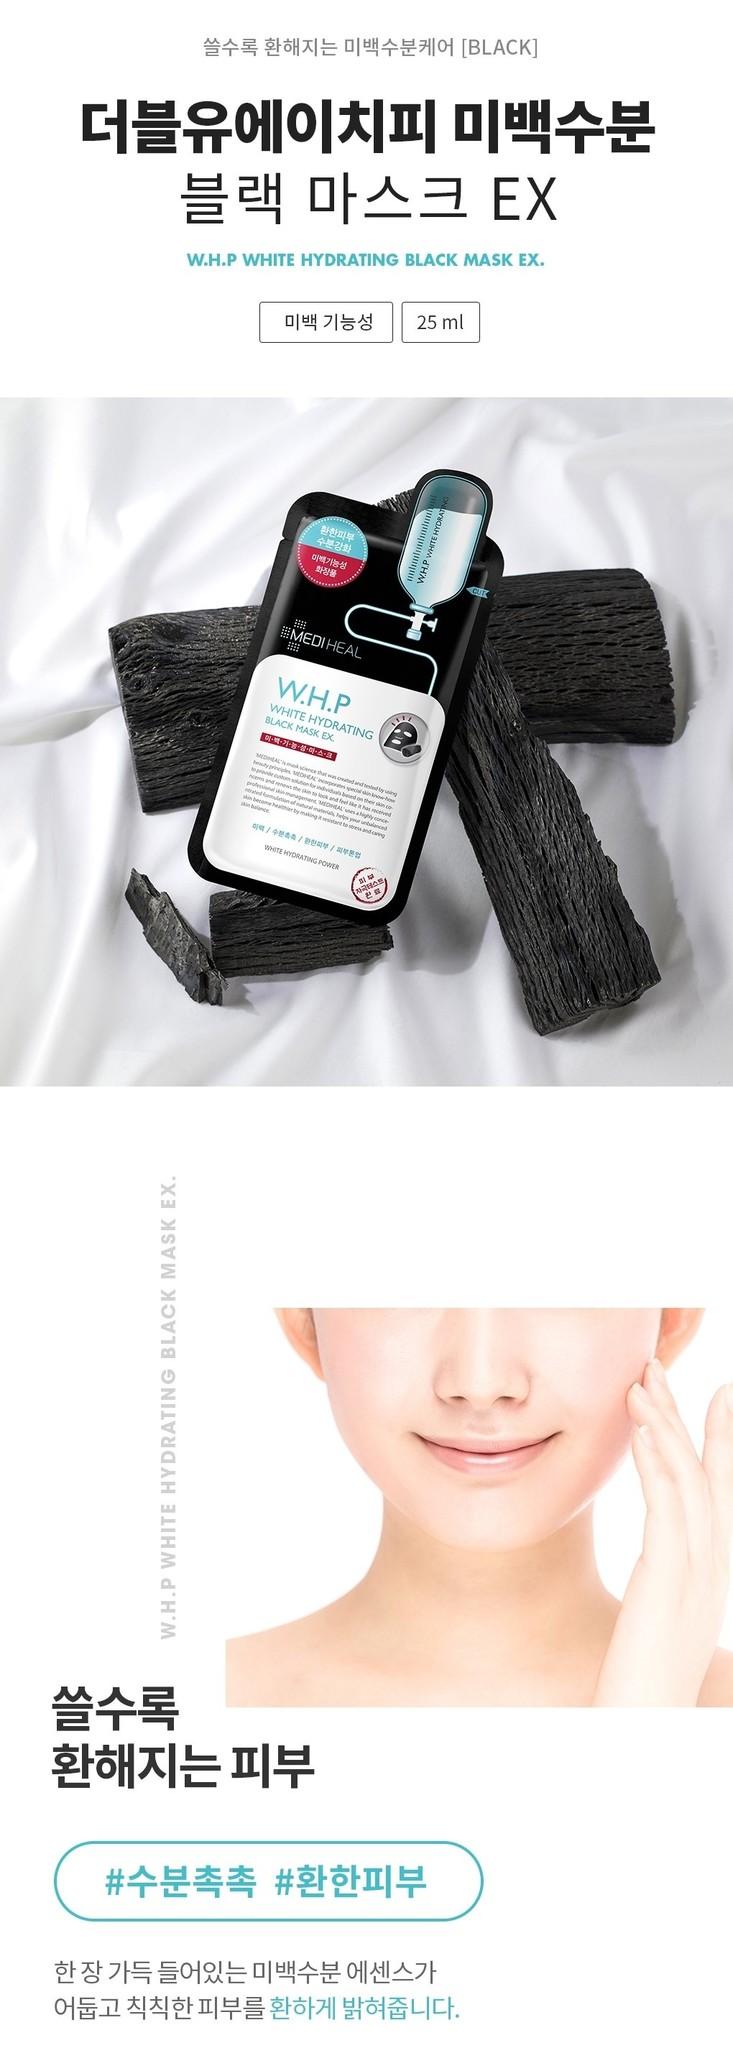 W.H.P White Hydrating Black Mask EX.-4